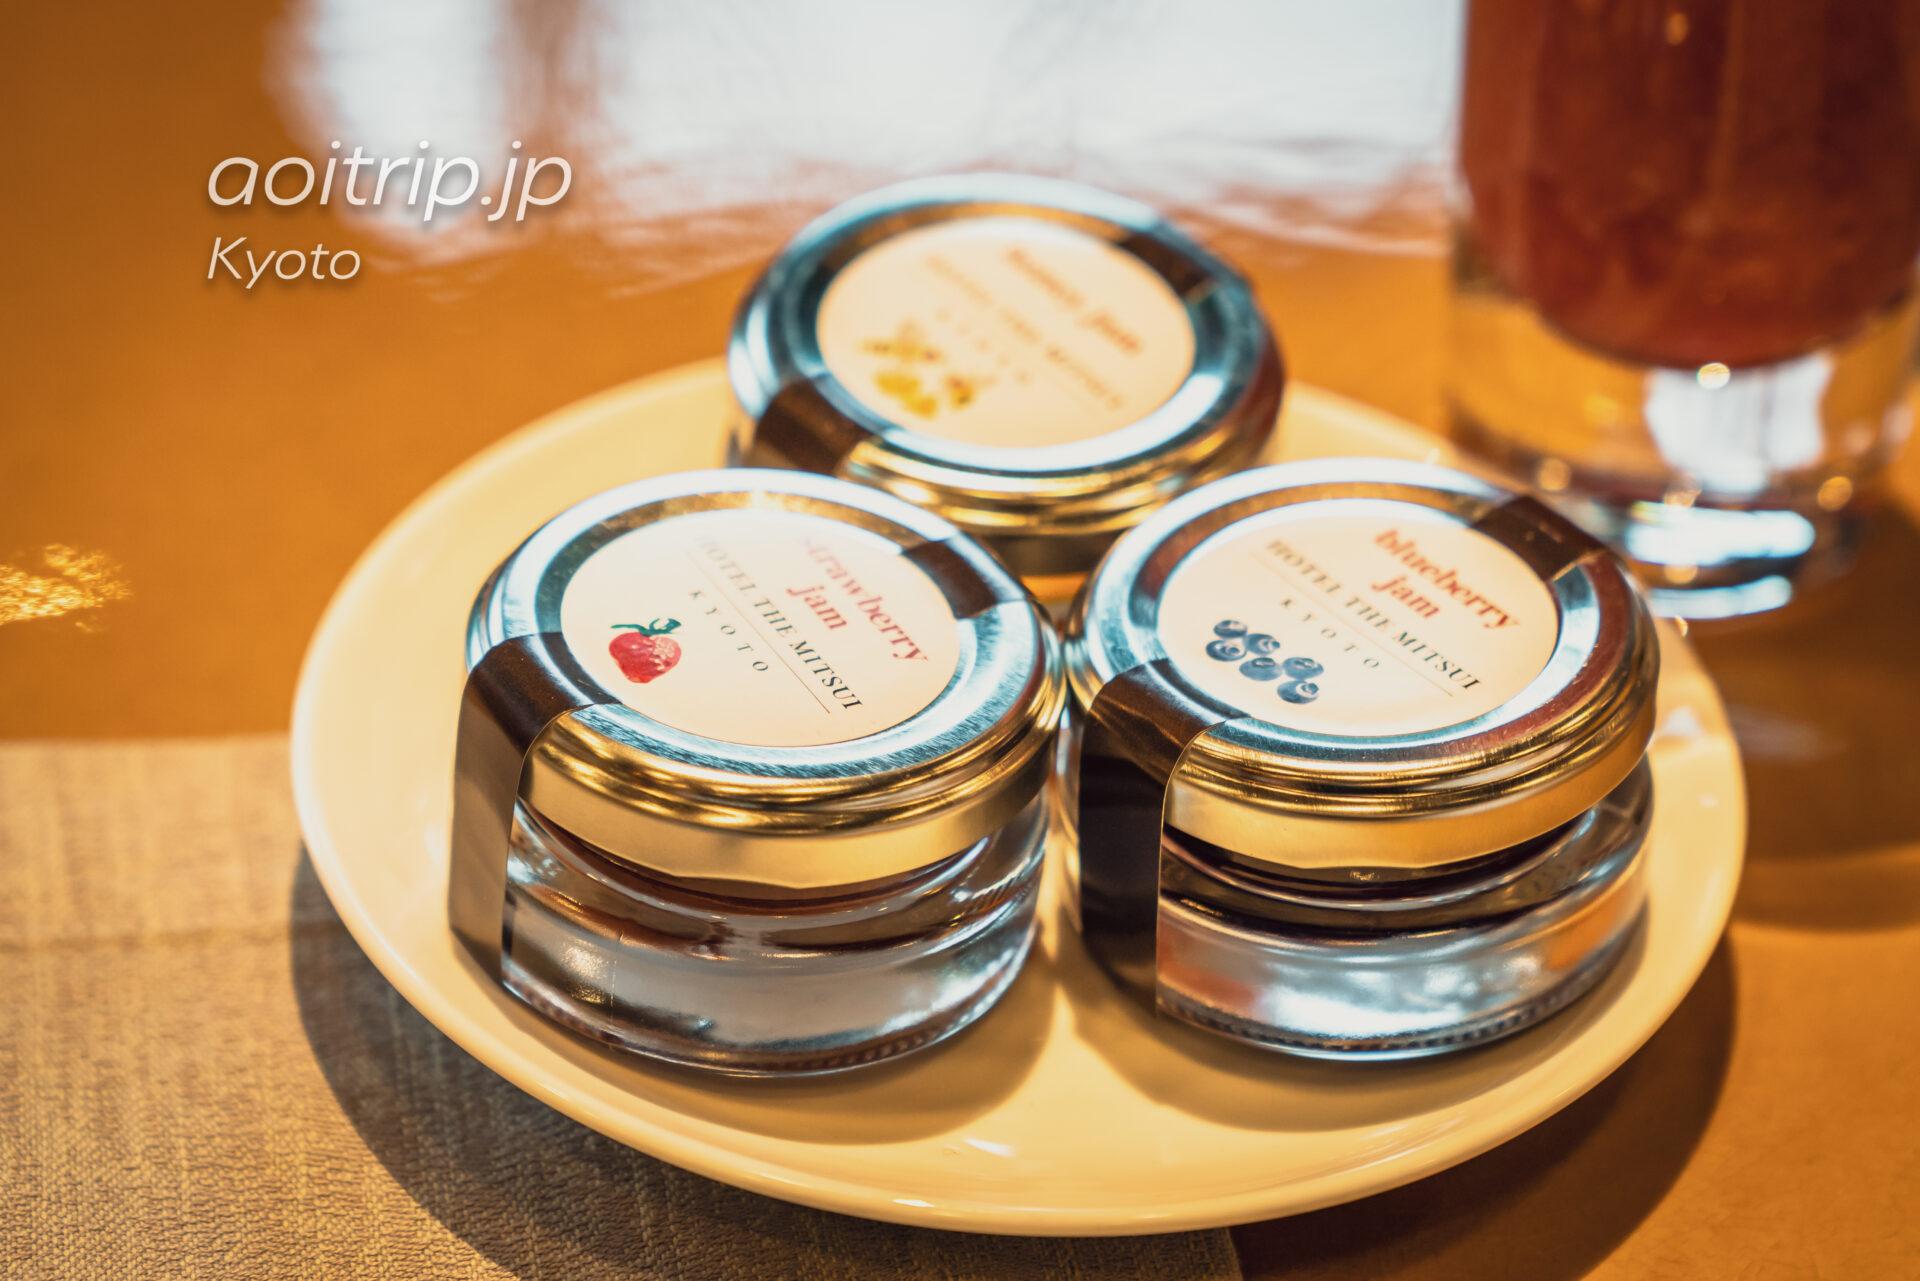 HOTEL THE MITSUI KYOTOの朝食のジャム